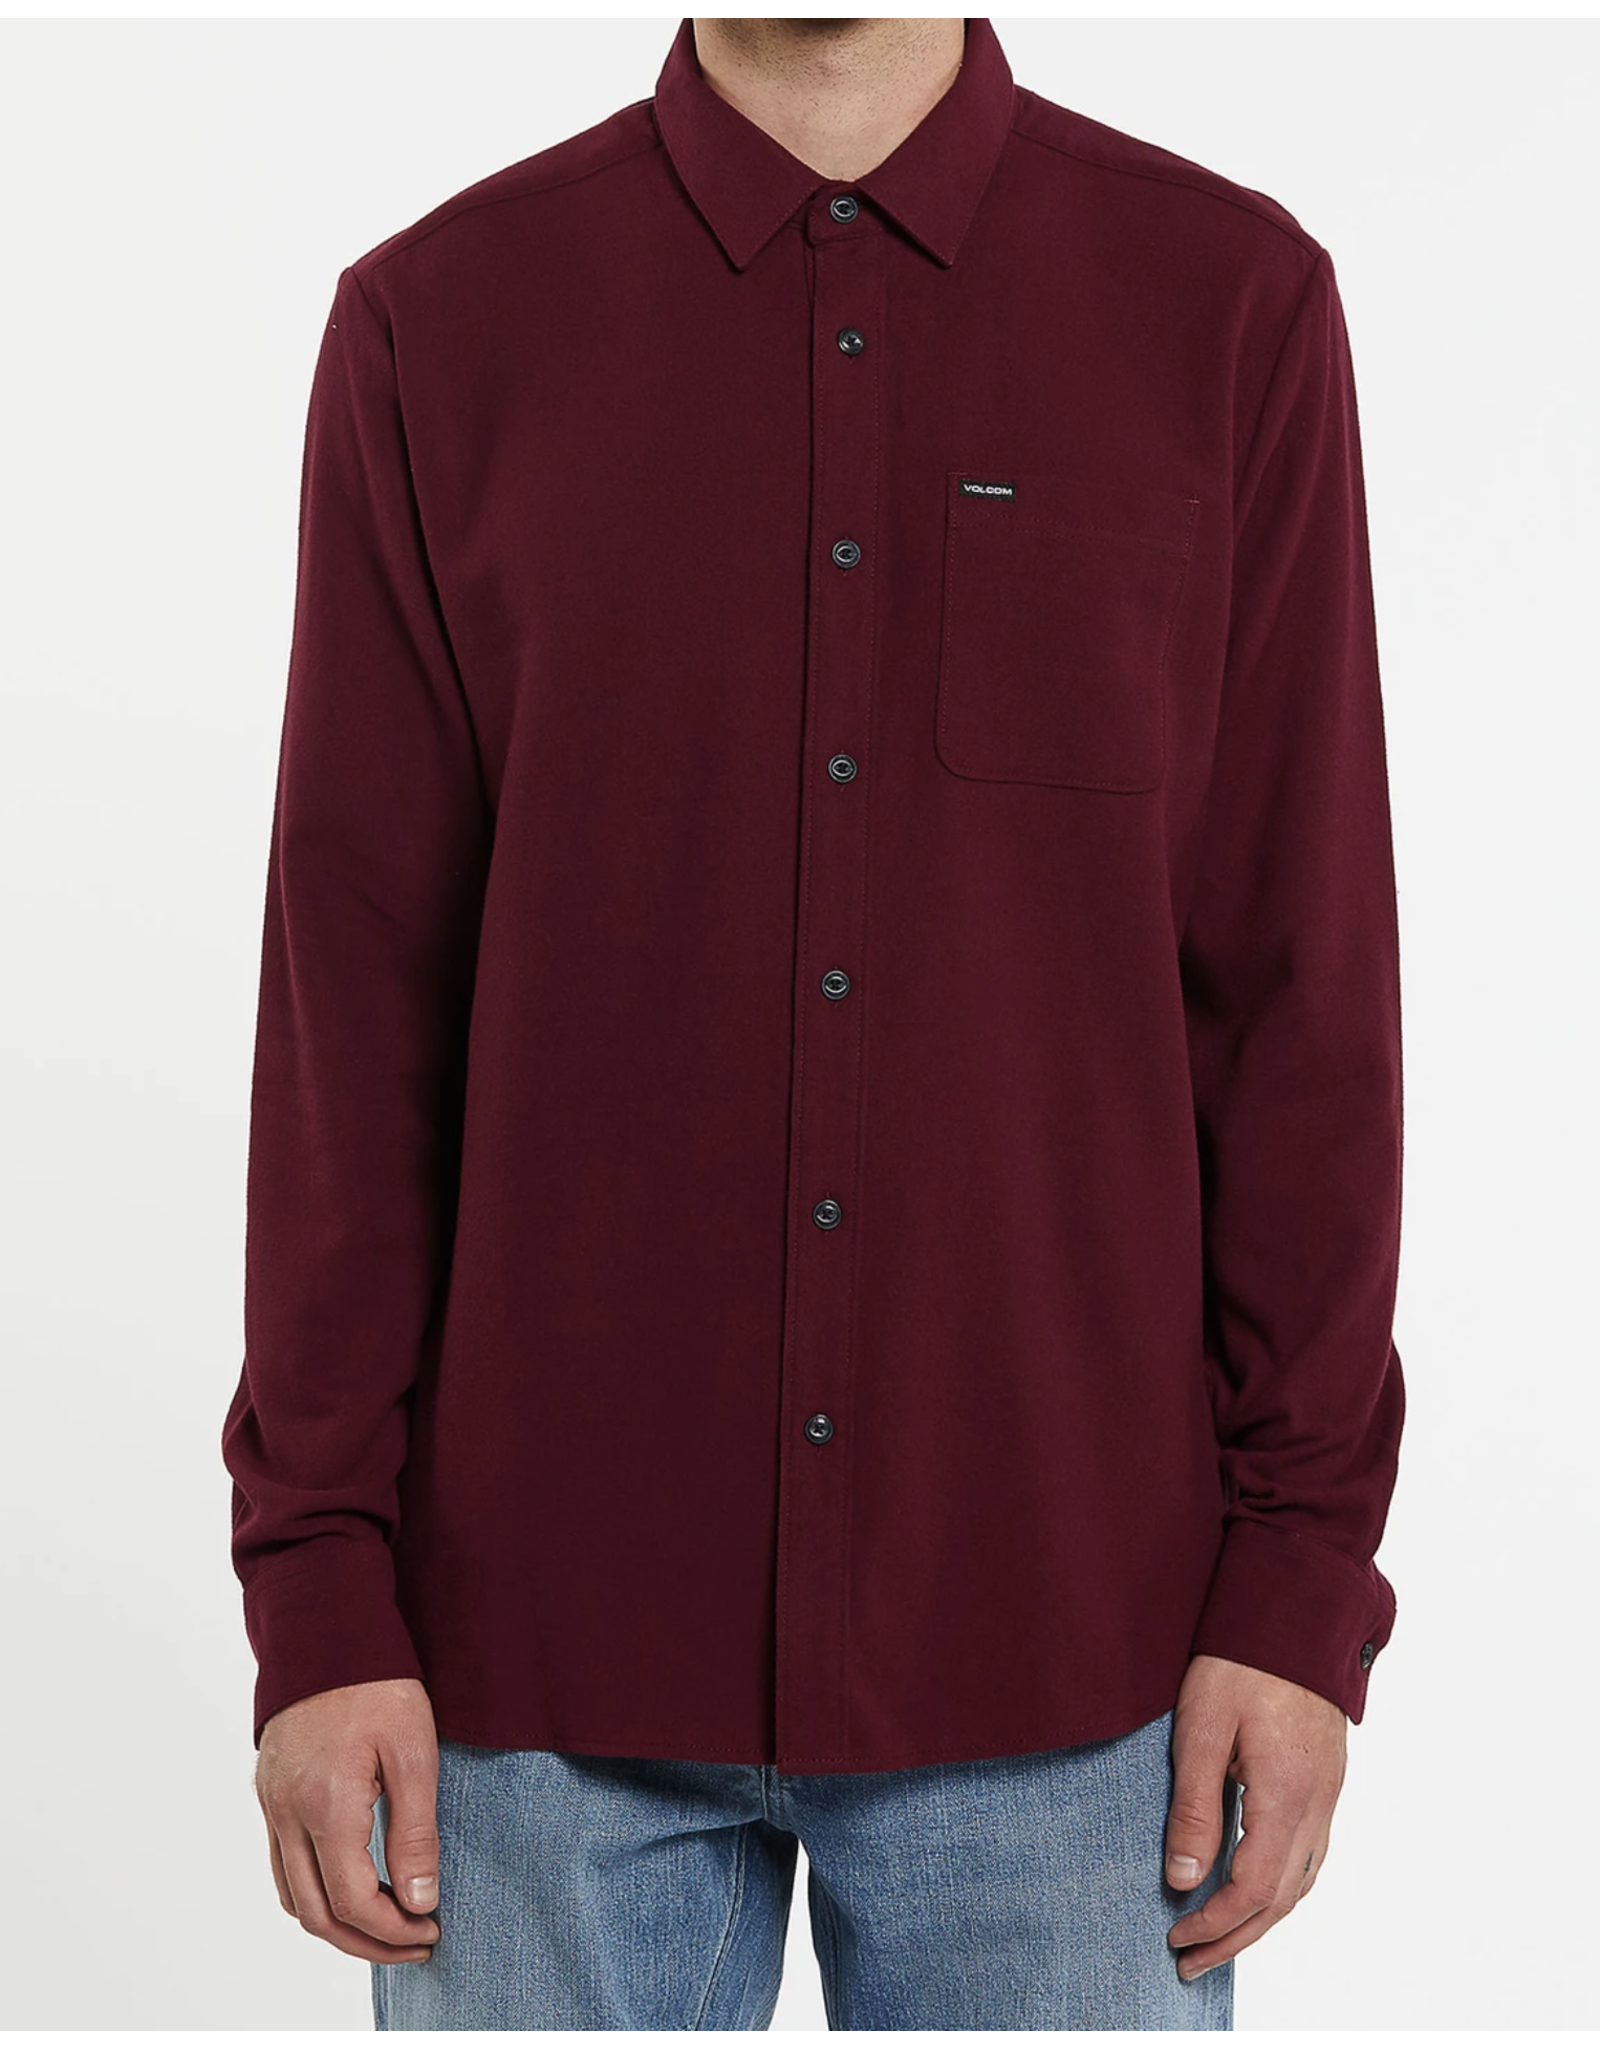 Volcom Caden Solid Long Sleeve Shirt - Port Royal